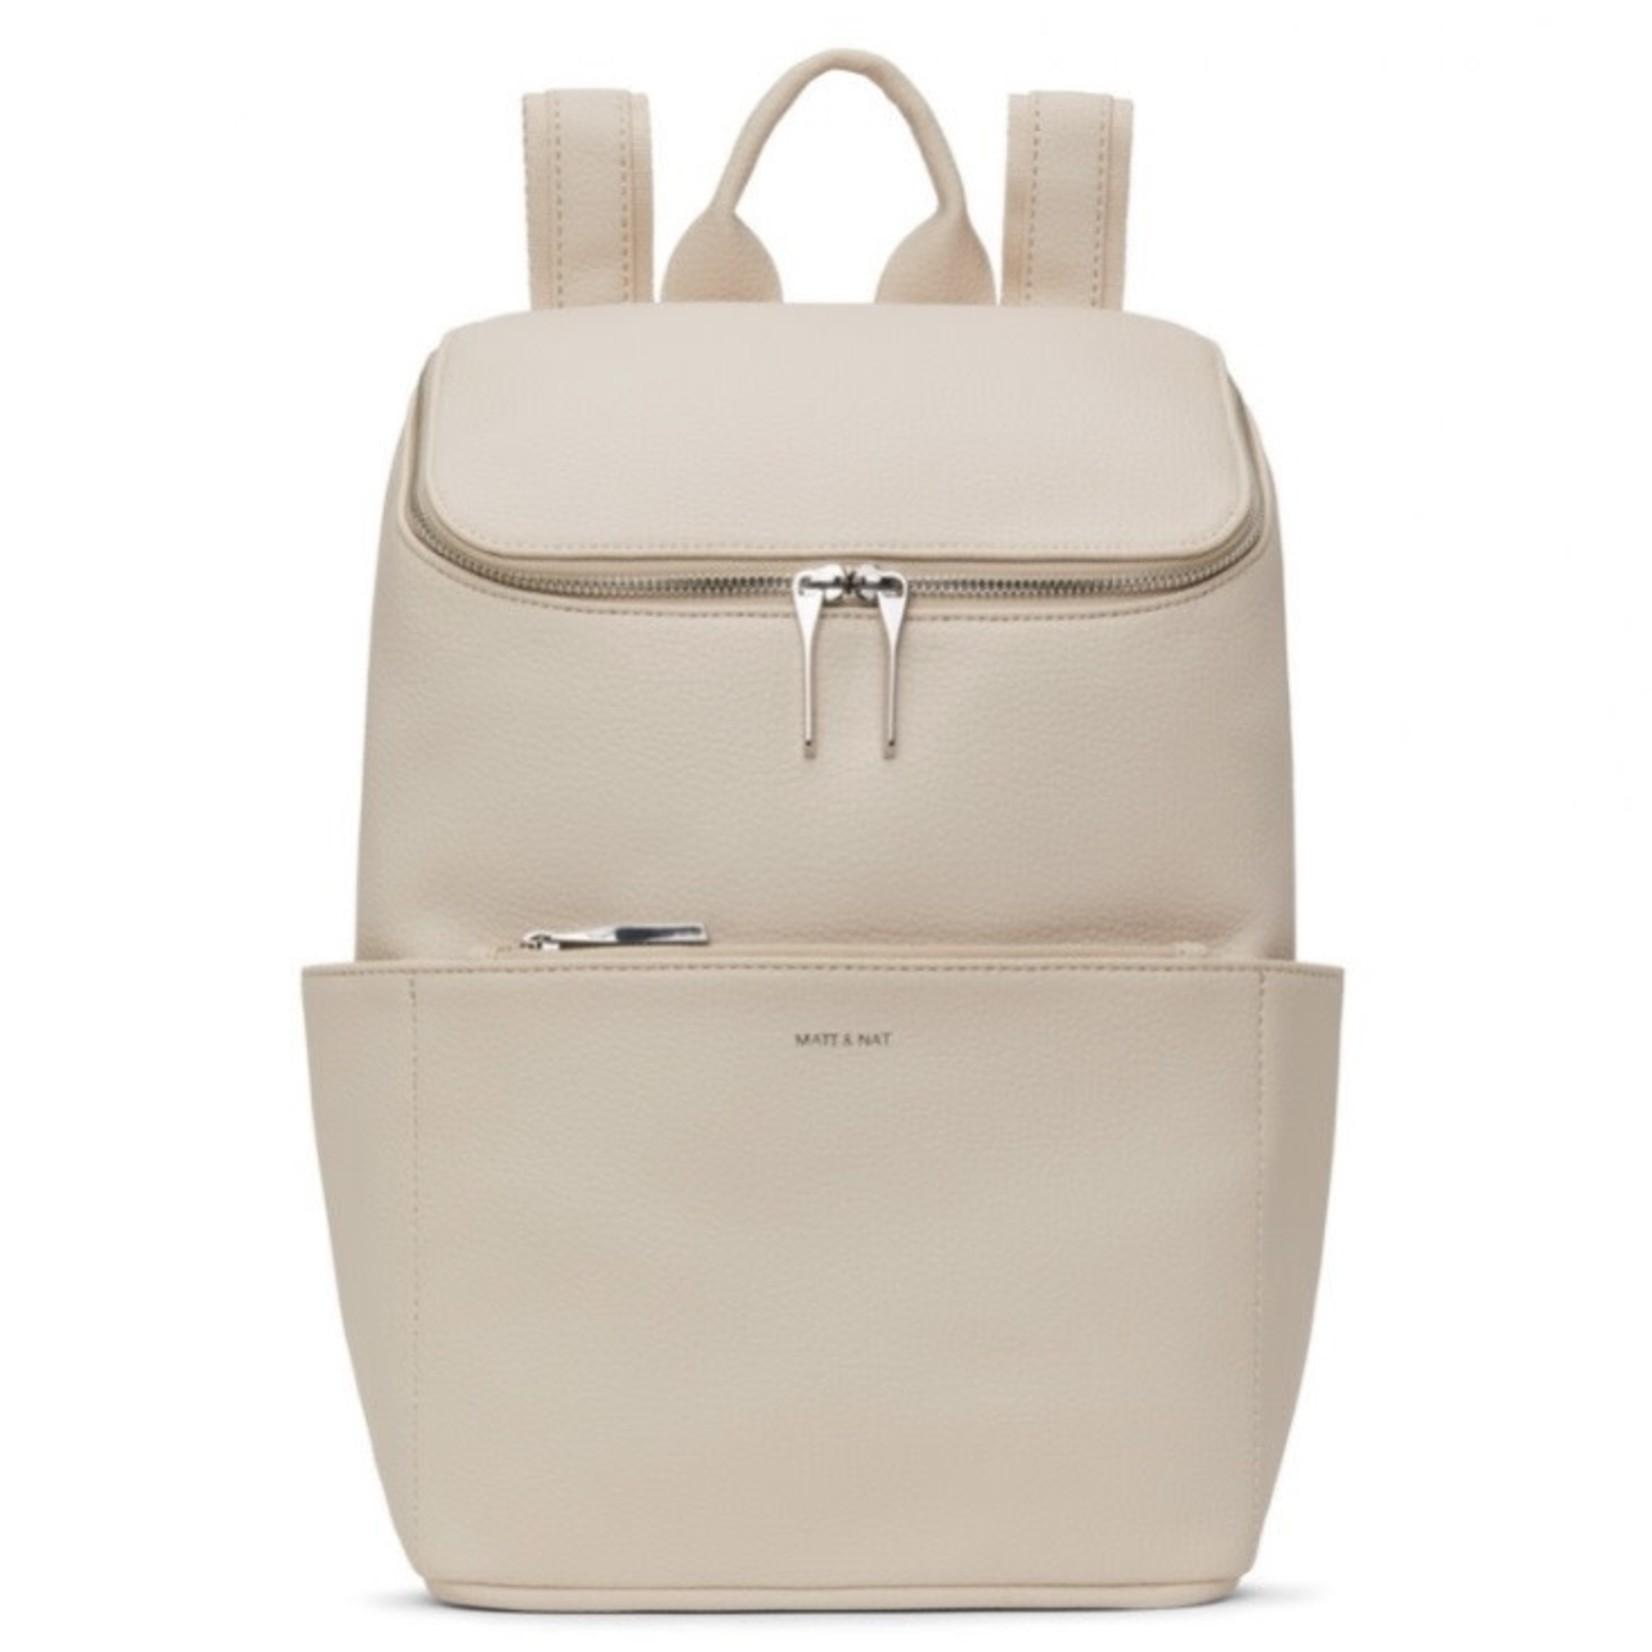 matt & nat Brave Purity Backpack Opal